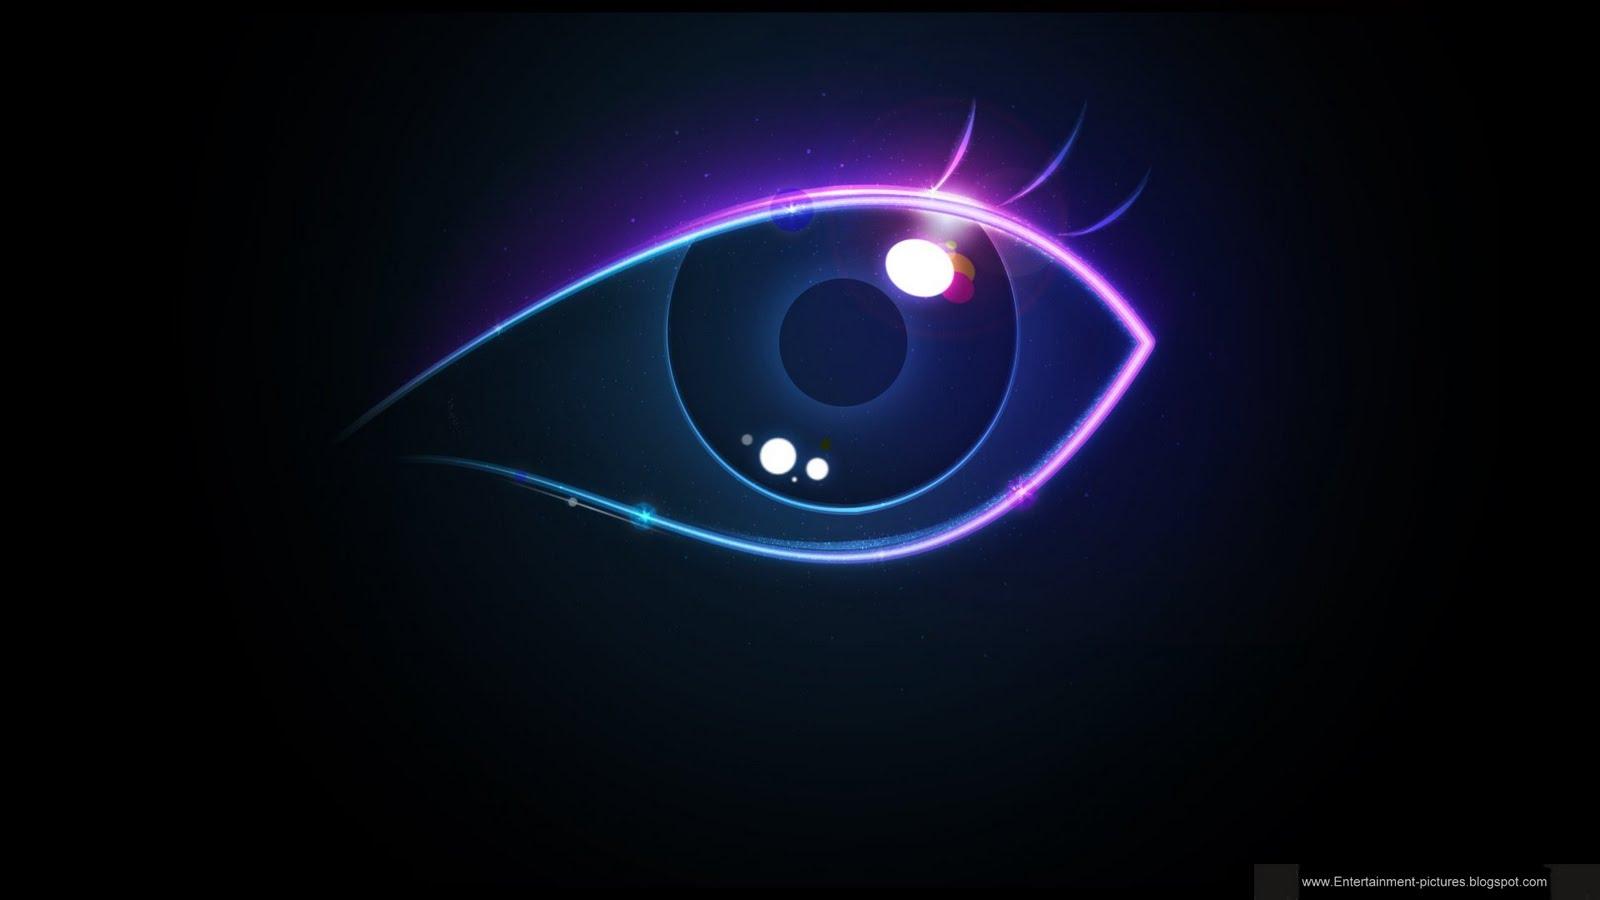 http://2.bp.blogspot.com/-Vnw7hhVmsKk/TdNjYYtIQ-I/AAAAAAAADks/4illFB4qMEA/s1600/creative_colorful_eye-1920x1080.jpg